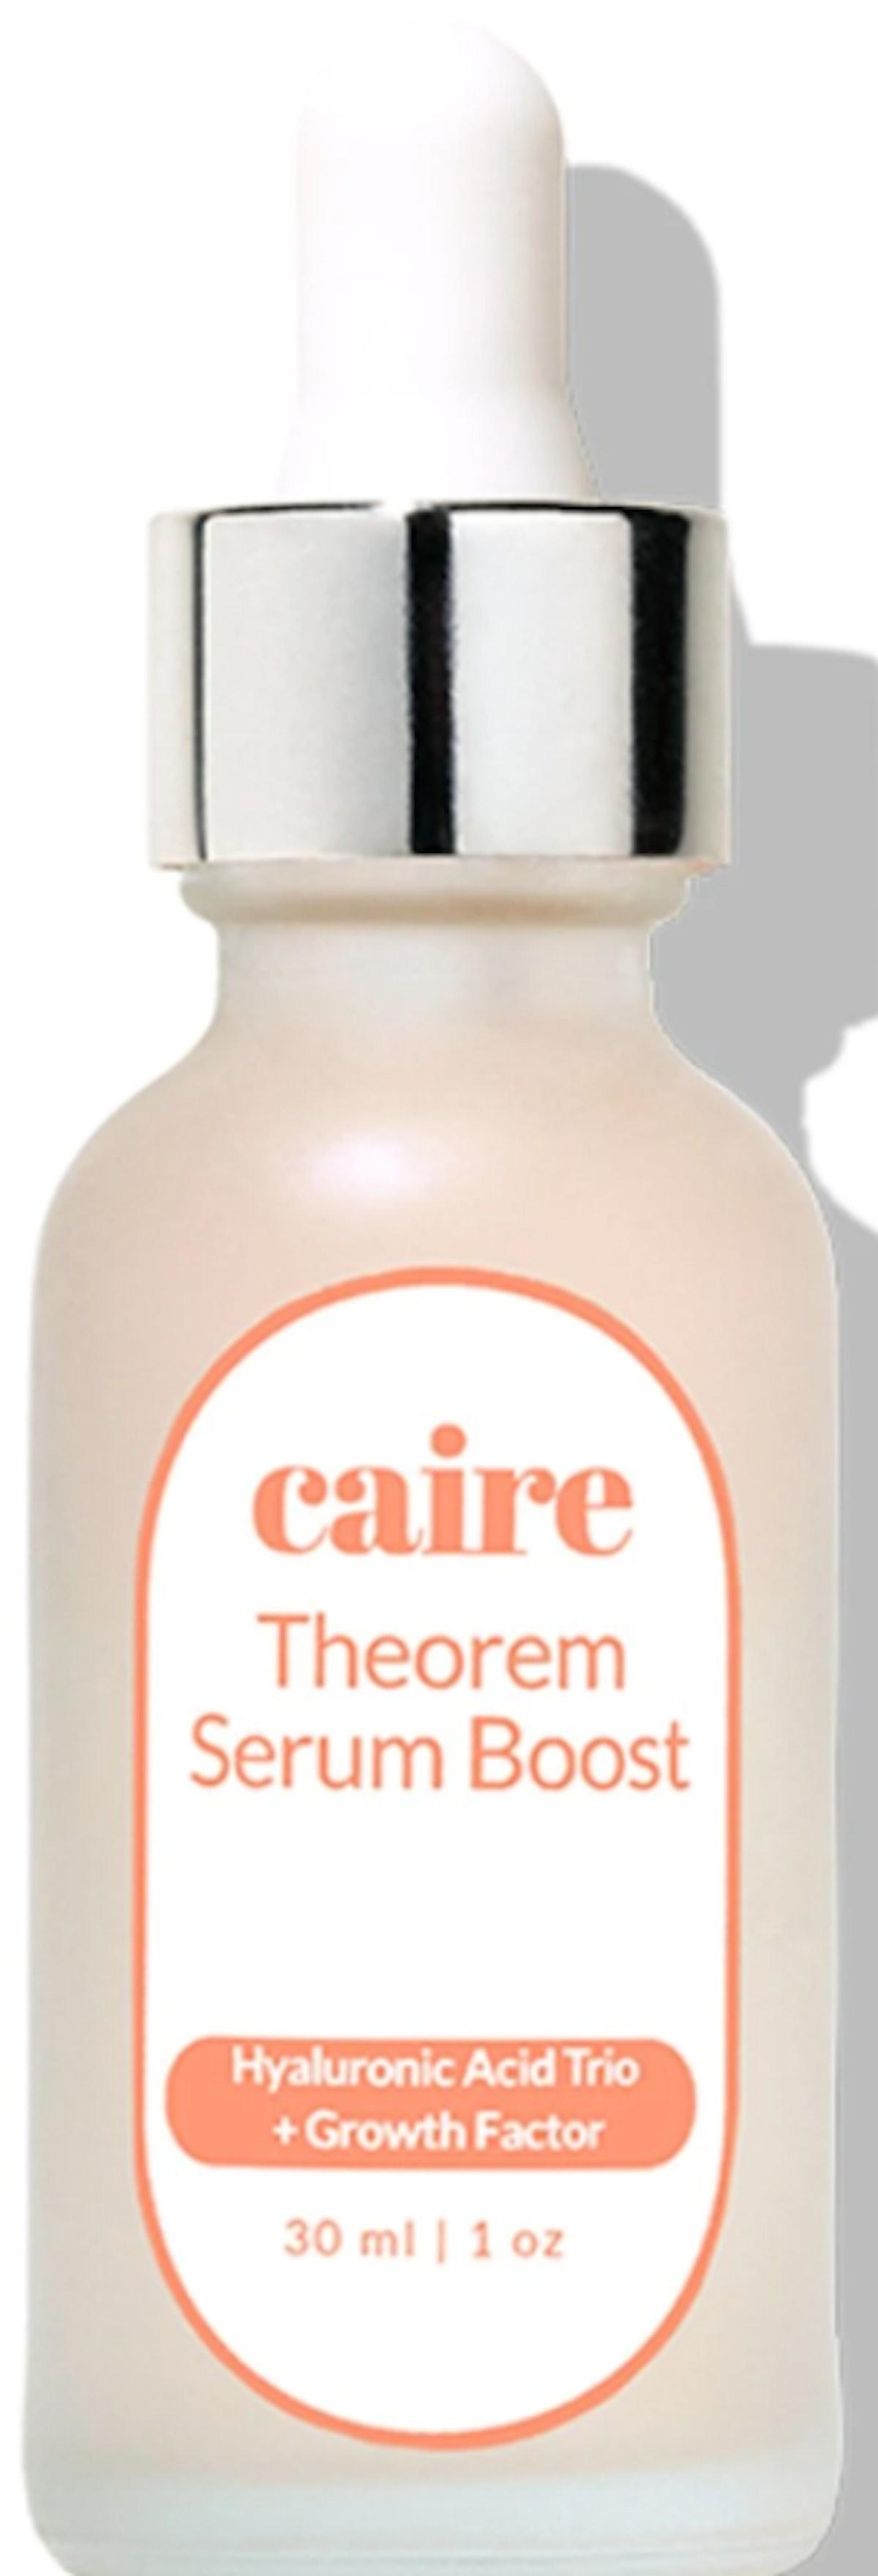 Theorem Serum Boost